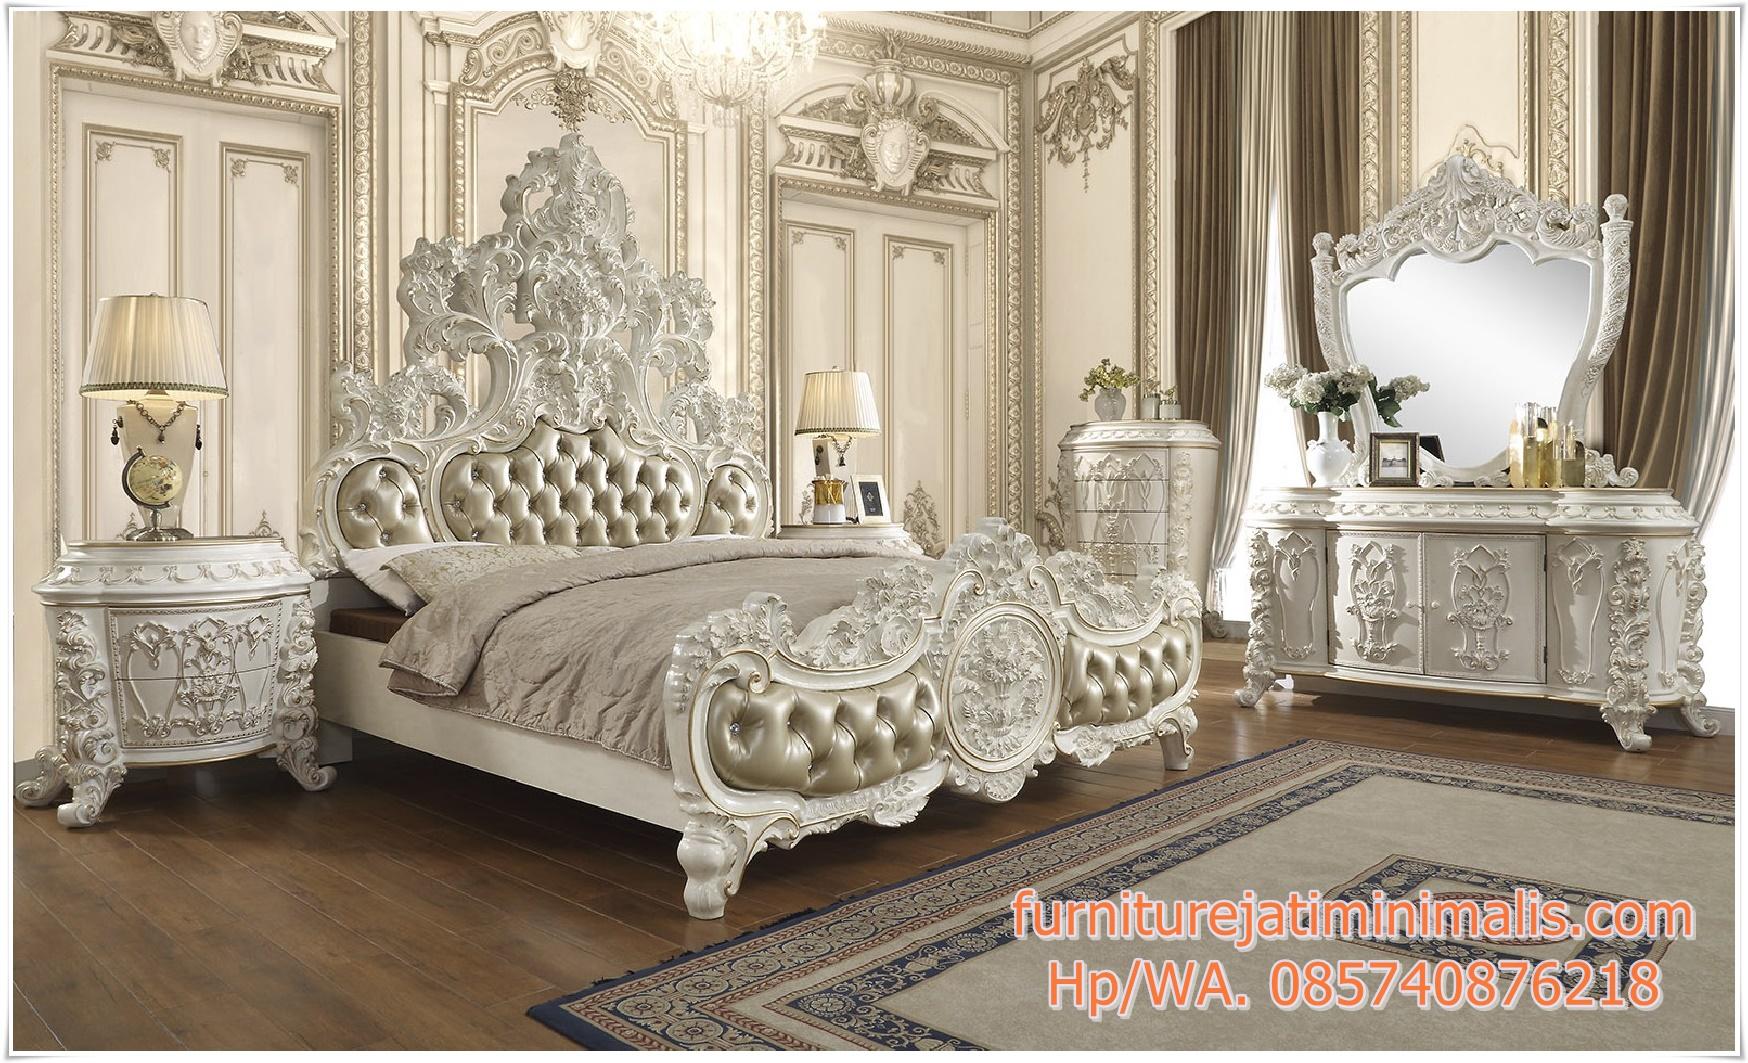 kamar tidur mewah ratu elizabet, kamar tidur mewah, kamr tidur mewah modern,kamar tidur mewah dan luas, kamar tidur mewah modern minimalis, kamar tidur mewah dan elegan, kamar tidur mewah klasik, kamar tidur mewah romantis, kamar mewah klasik, desain kamar tidur utama